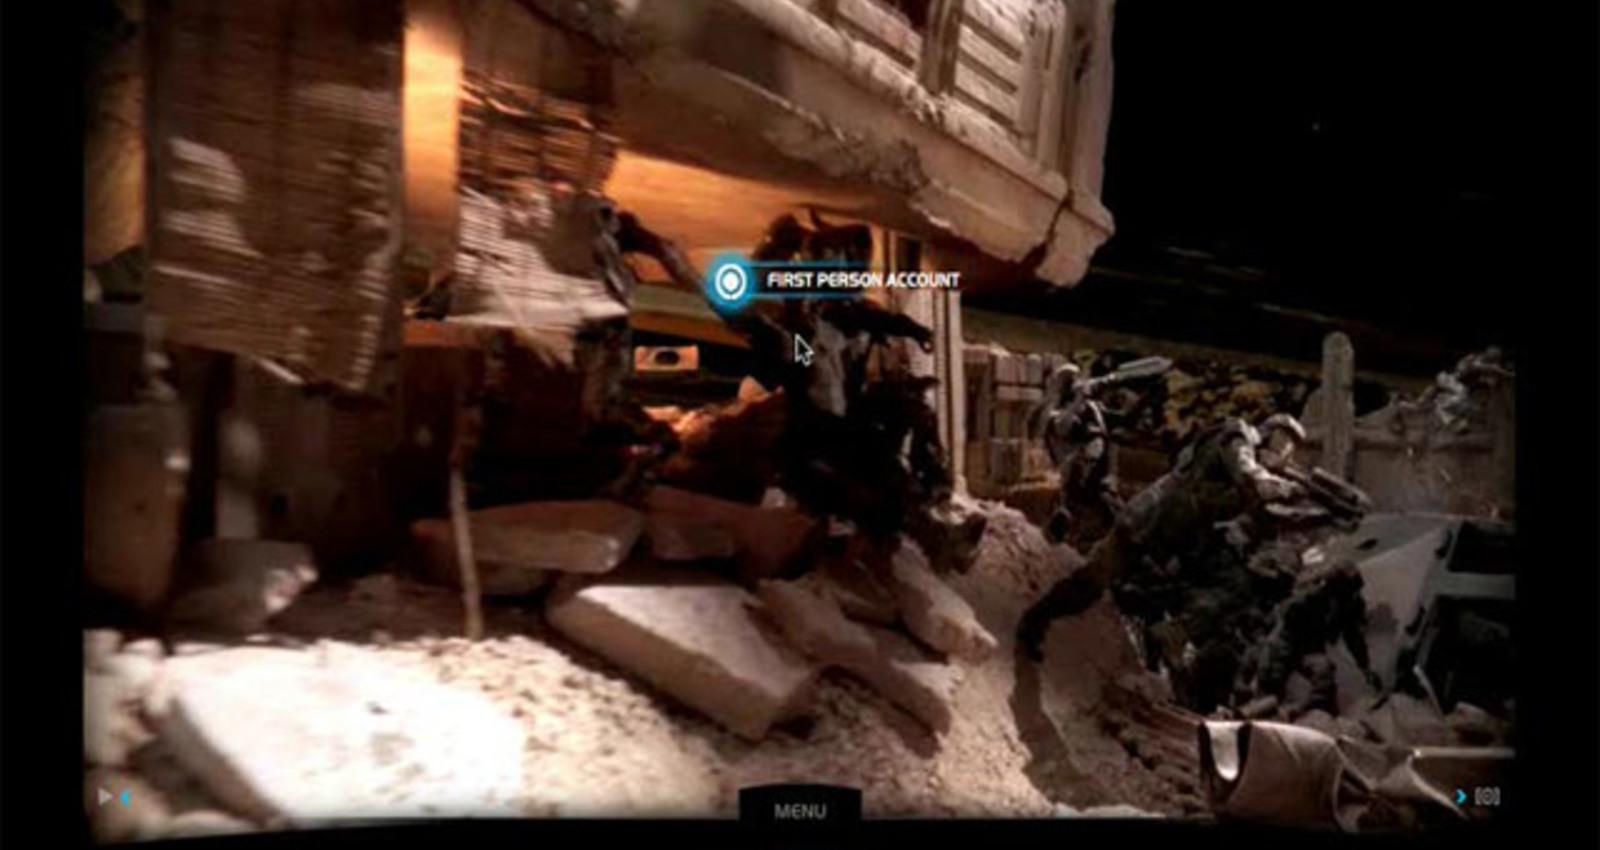 Halo3.com/Believe